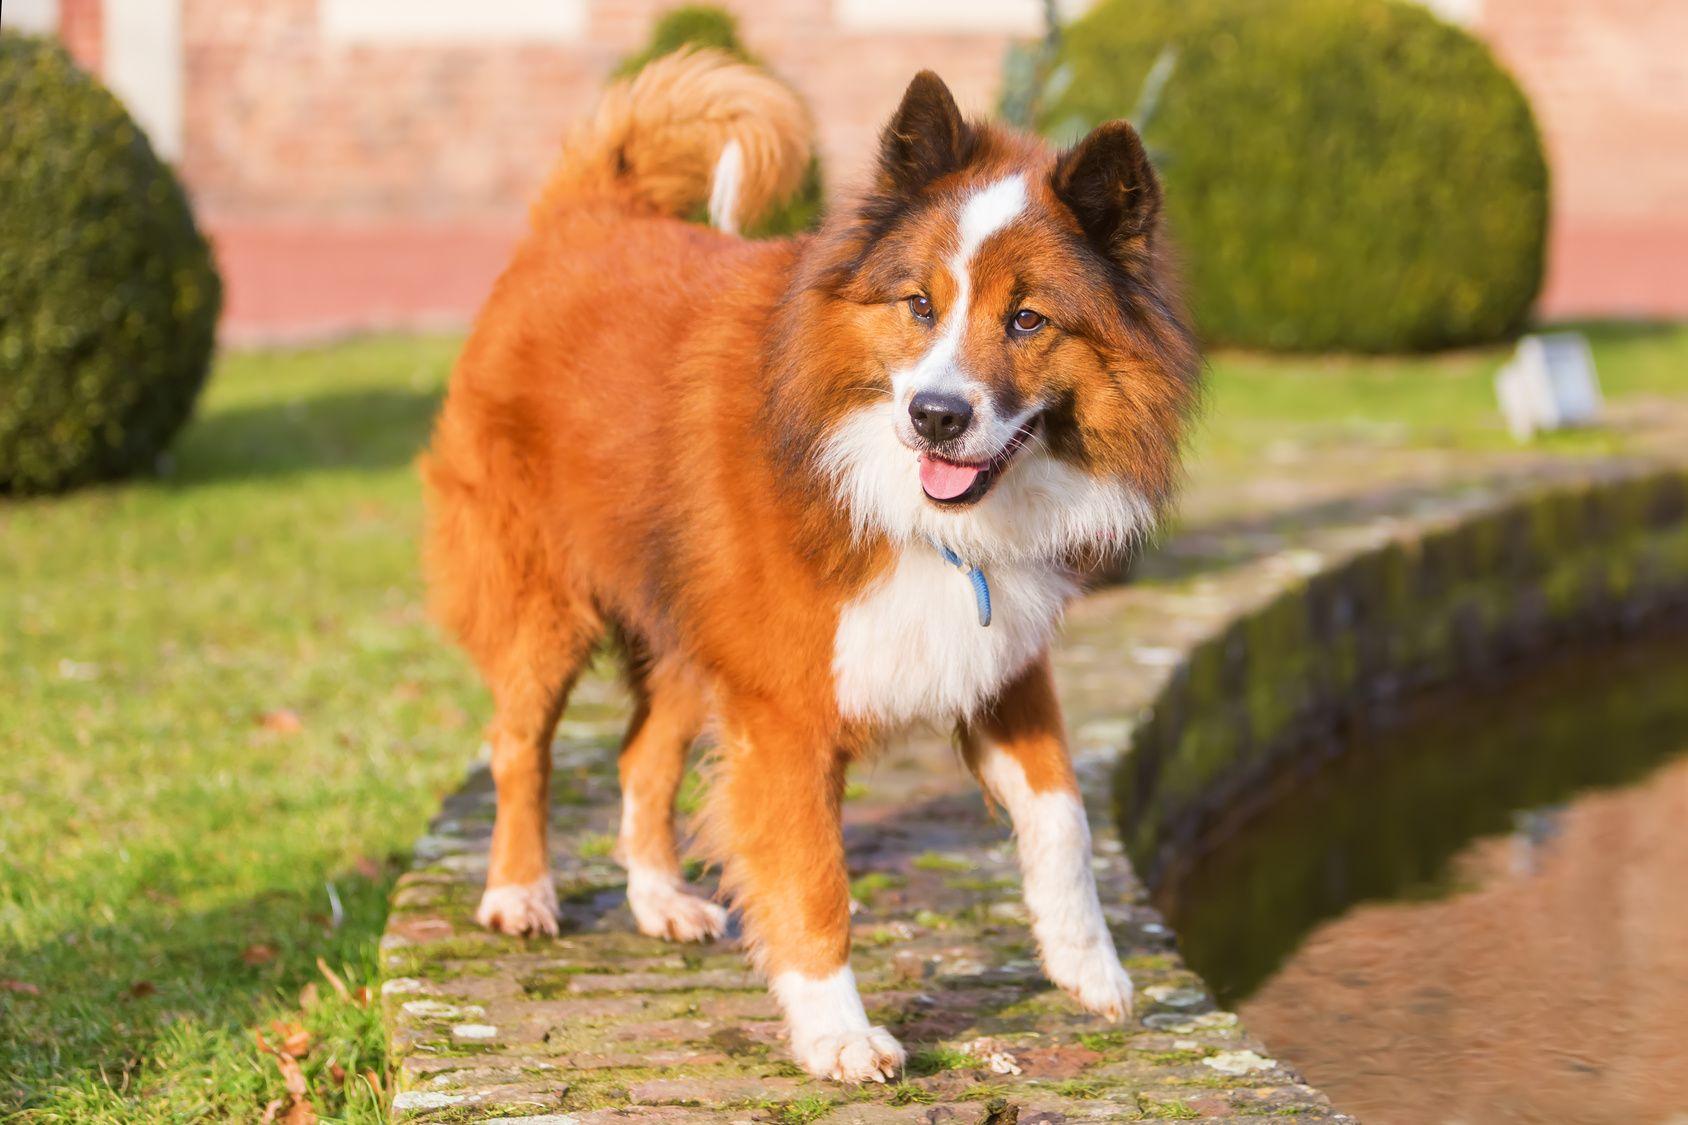 Pin Auf Det Behovs En Egen For Hundar